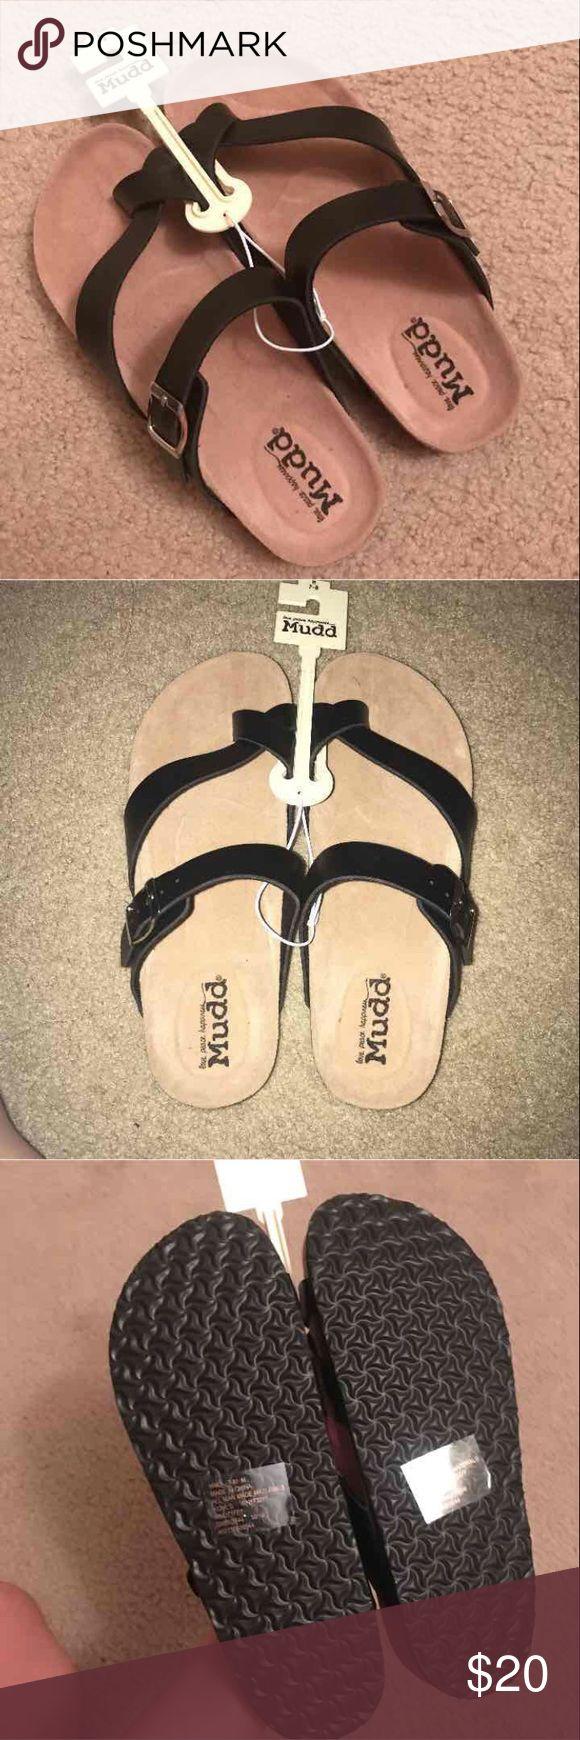 Black Birkenstocks Mudd jesus sandals that resemble Birkenstocks. NEW have never been used. Originally $30   Tags: Victoria secret,mudd, Birkenstock, neverfull, pink, sandals, neverfull, Levi's, James Avery Shoes Sandals